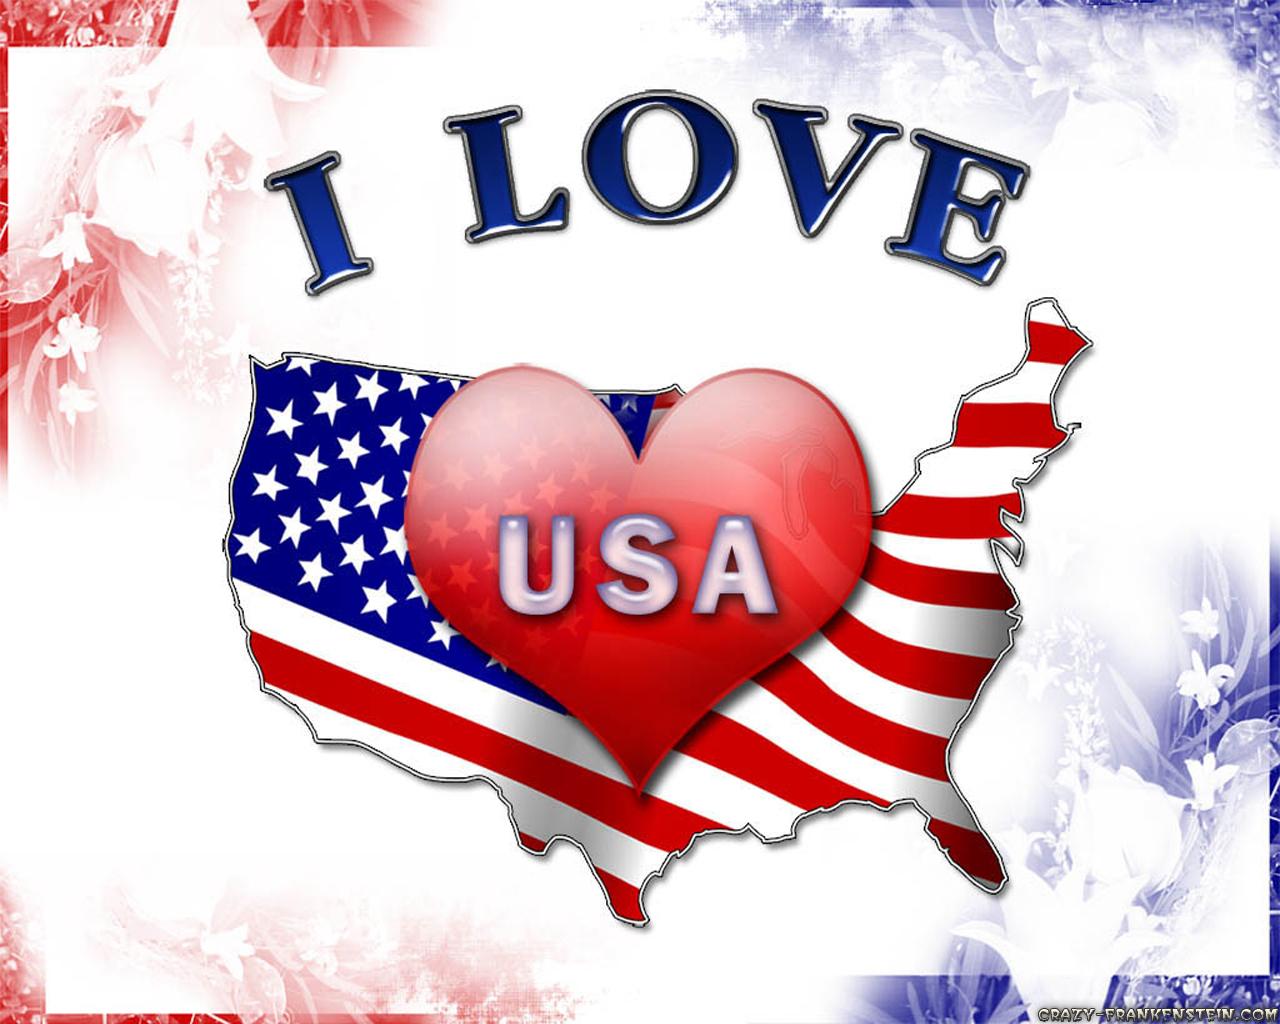 USA Wallpaper | McSearcher com